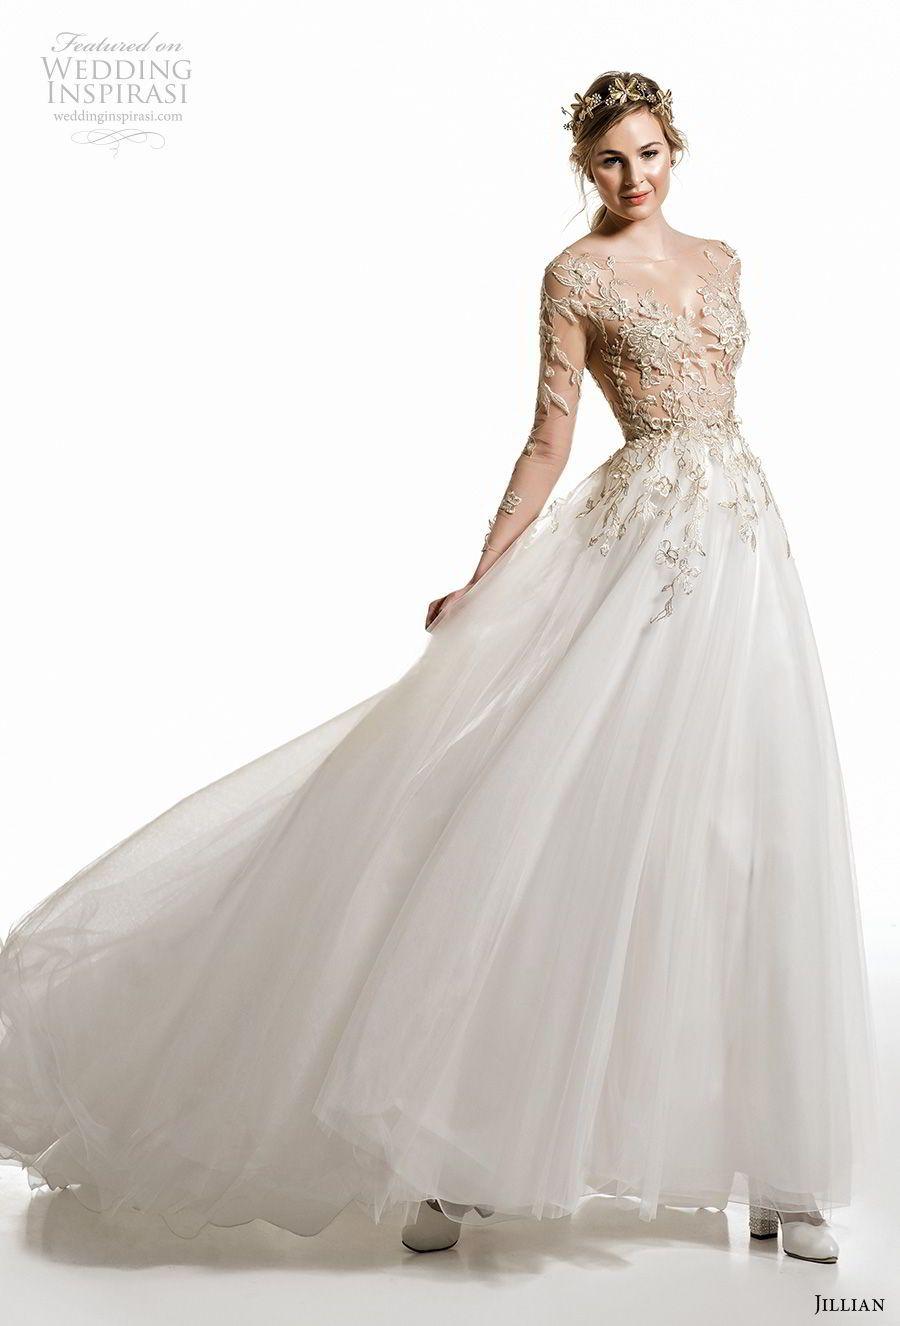 Jillian wedding dresses fantazia couture pinterest